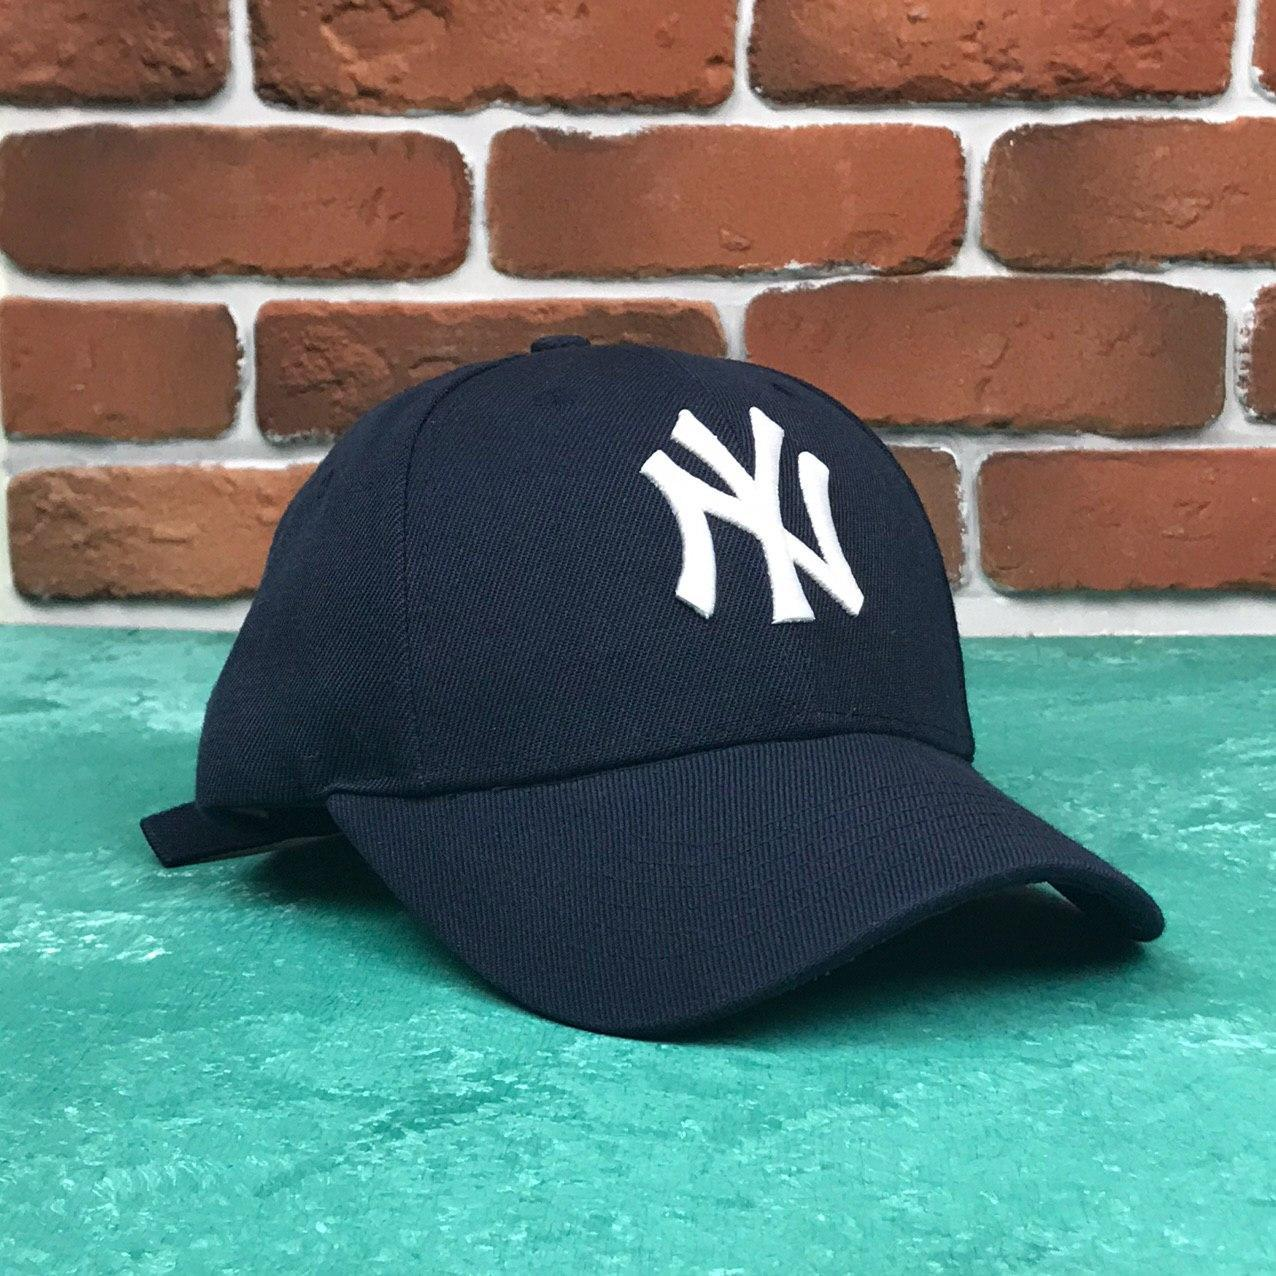 Кепка Бейсболка Мужская Женская MLB New York Yankees NY Темно-Синяя с Белым лого